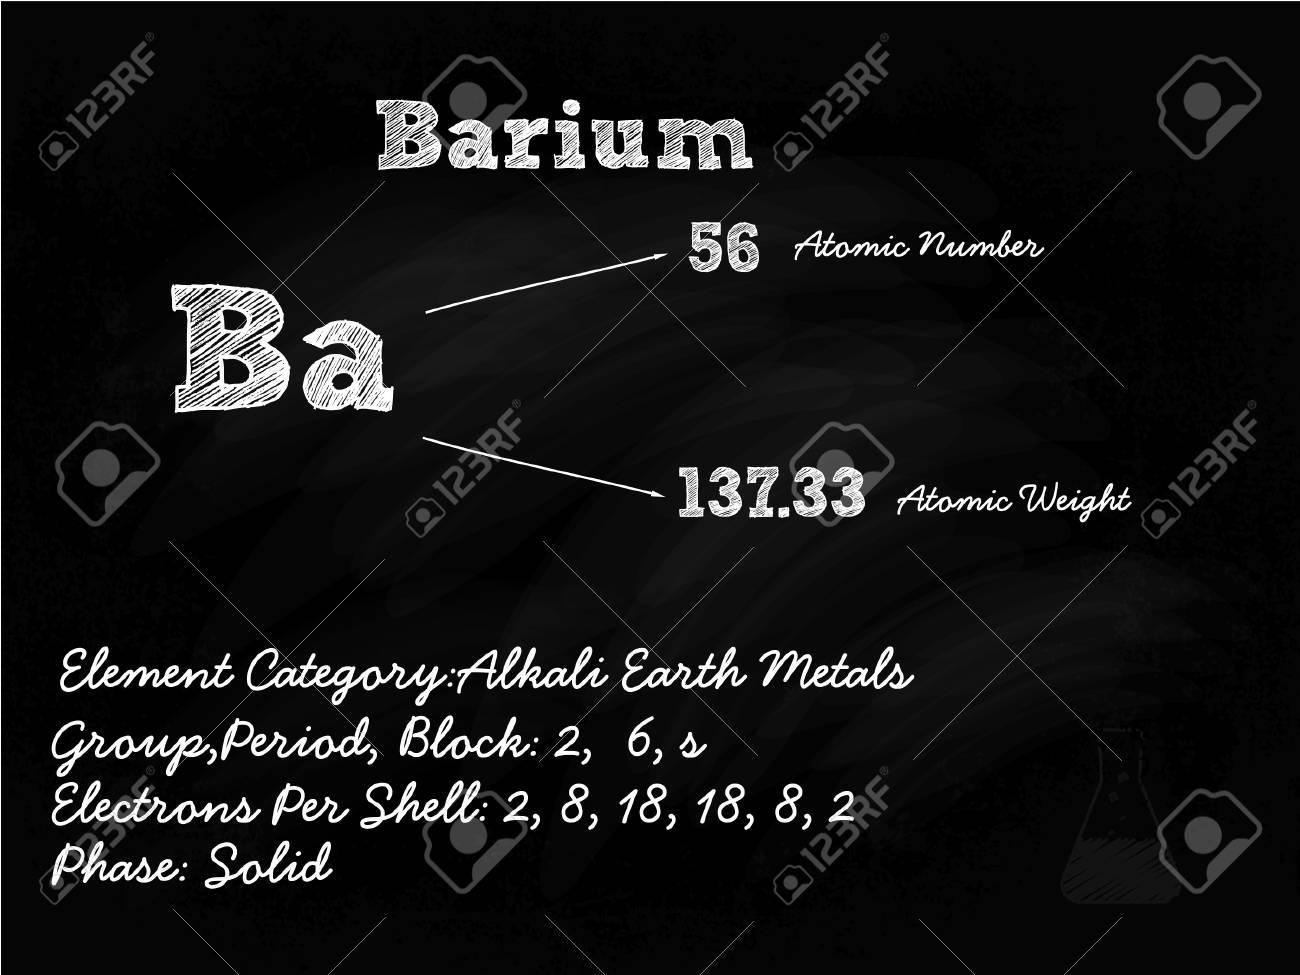 Barium symbol illustration on blackboard with chalk royalty free barium symbol illustration on blackboard with chalk stock vector 22171211 biocorpaavc Images